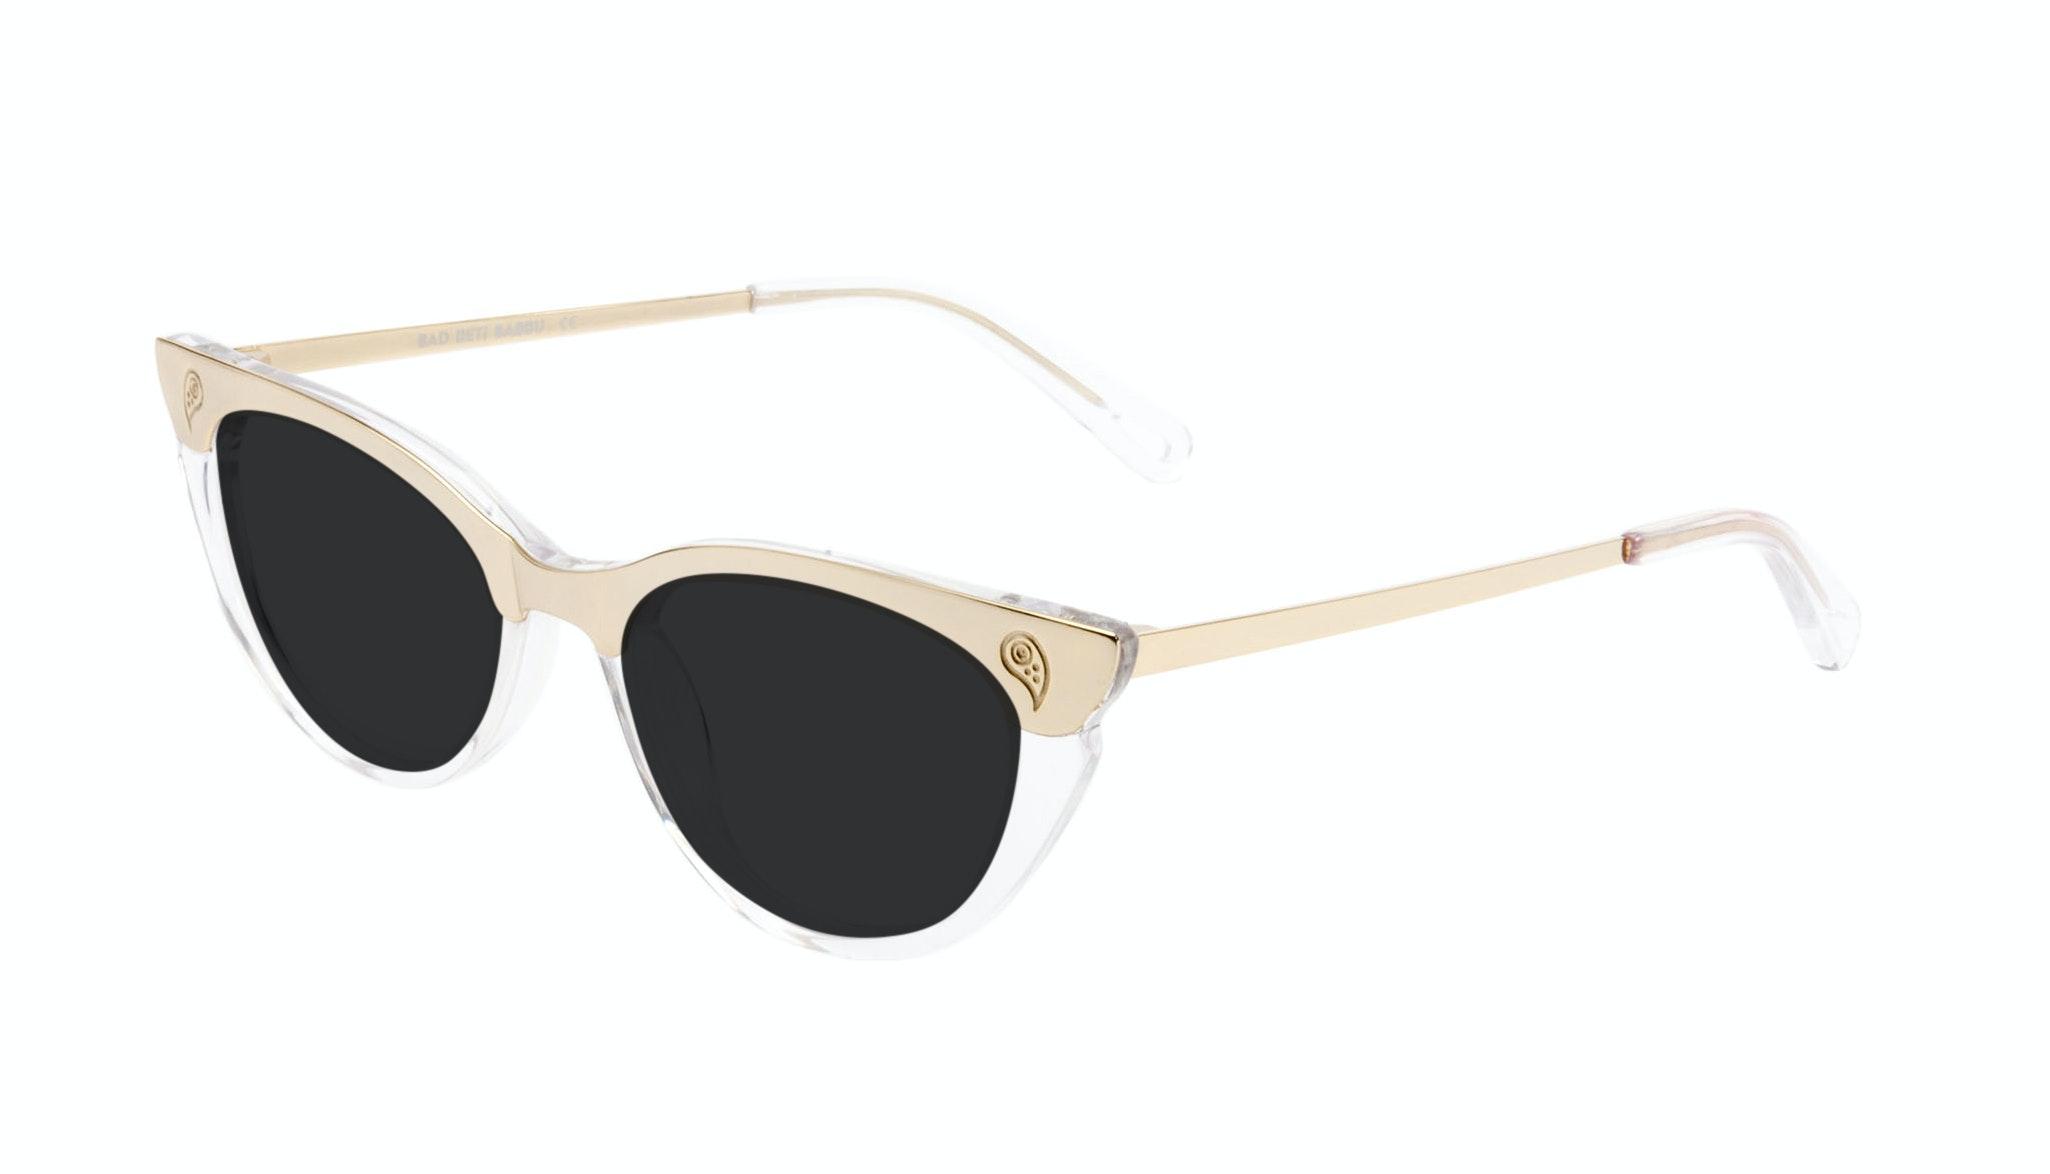 Affordable Fashion Glasses Cat Eye Daring Cateye Sunglasses Women Bad Beti Babbu Tilt